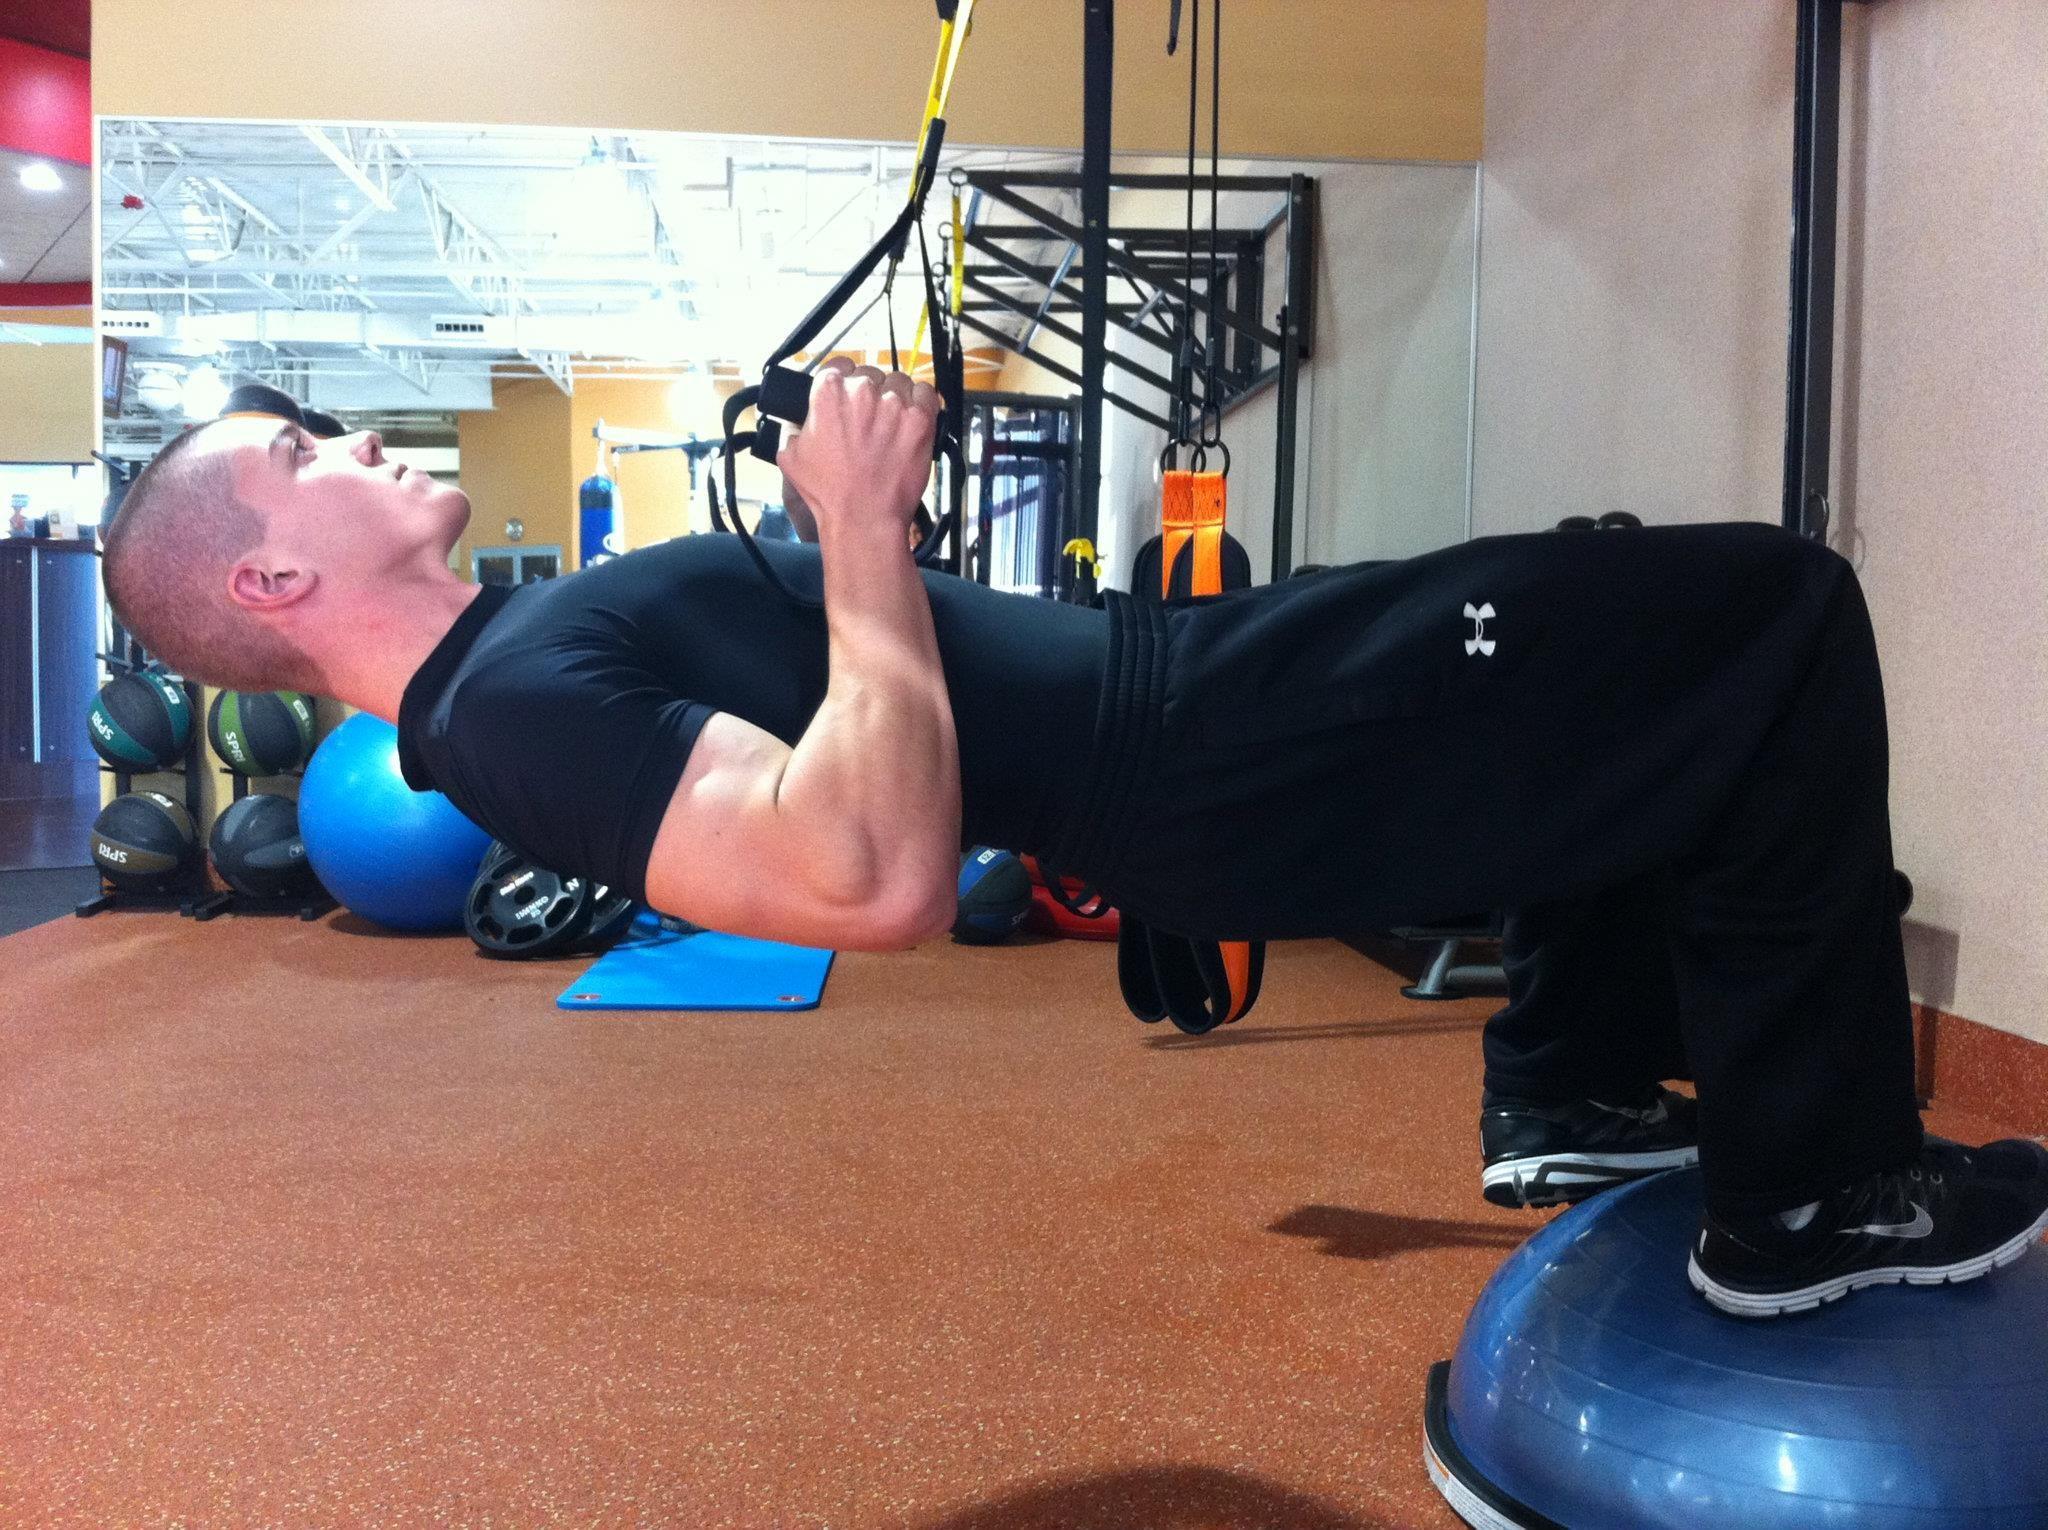 Gym Fitness Club Metro Usa Gym In Marlton Nj Usa Gym Gym Workouts Gym